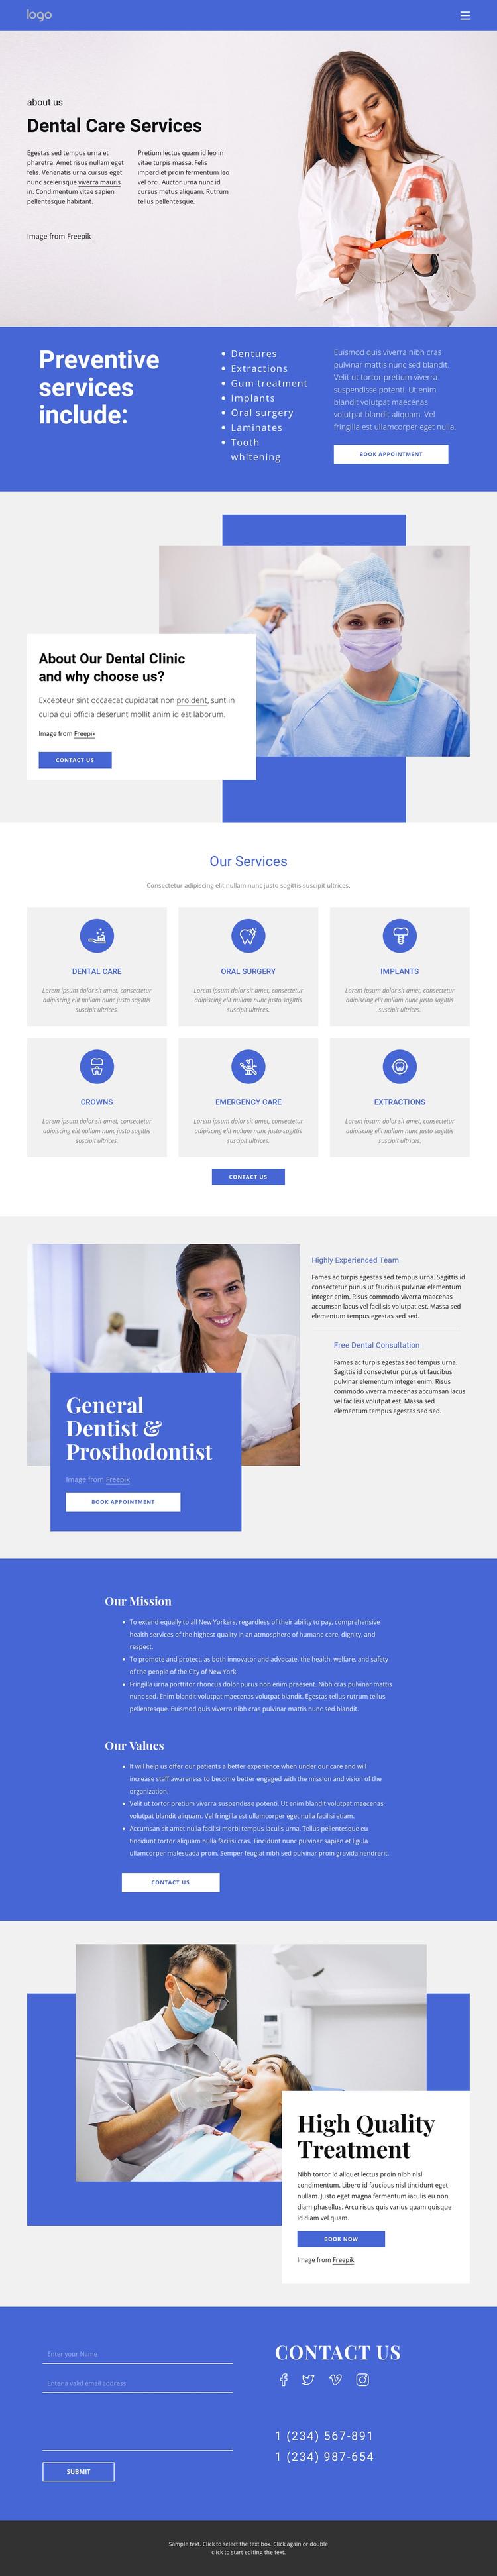 Dentist and prosthodontics Website Builder Software